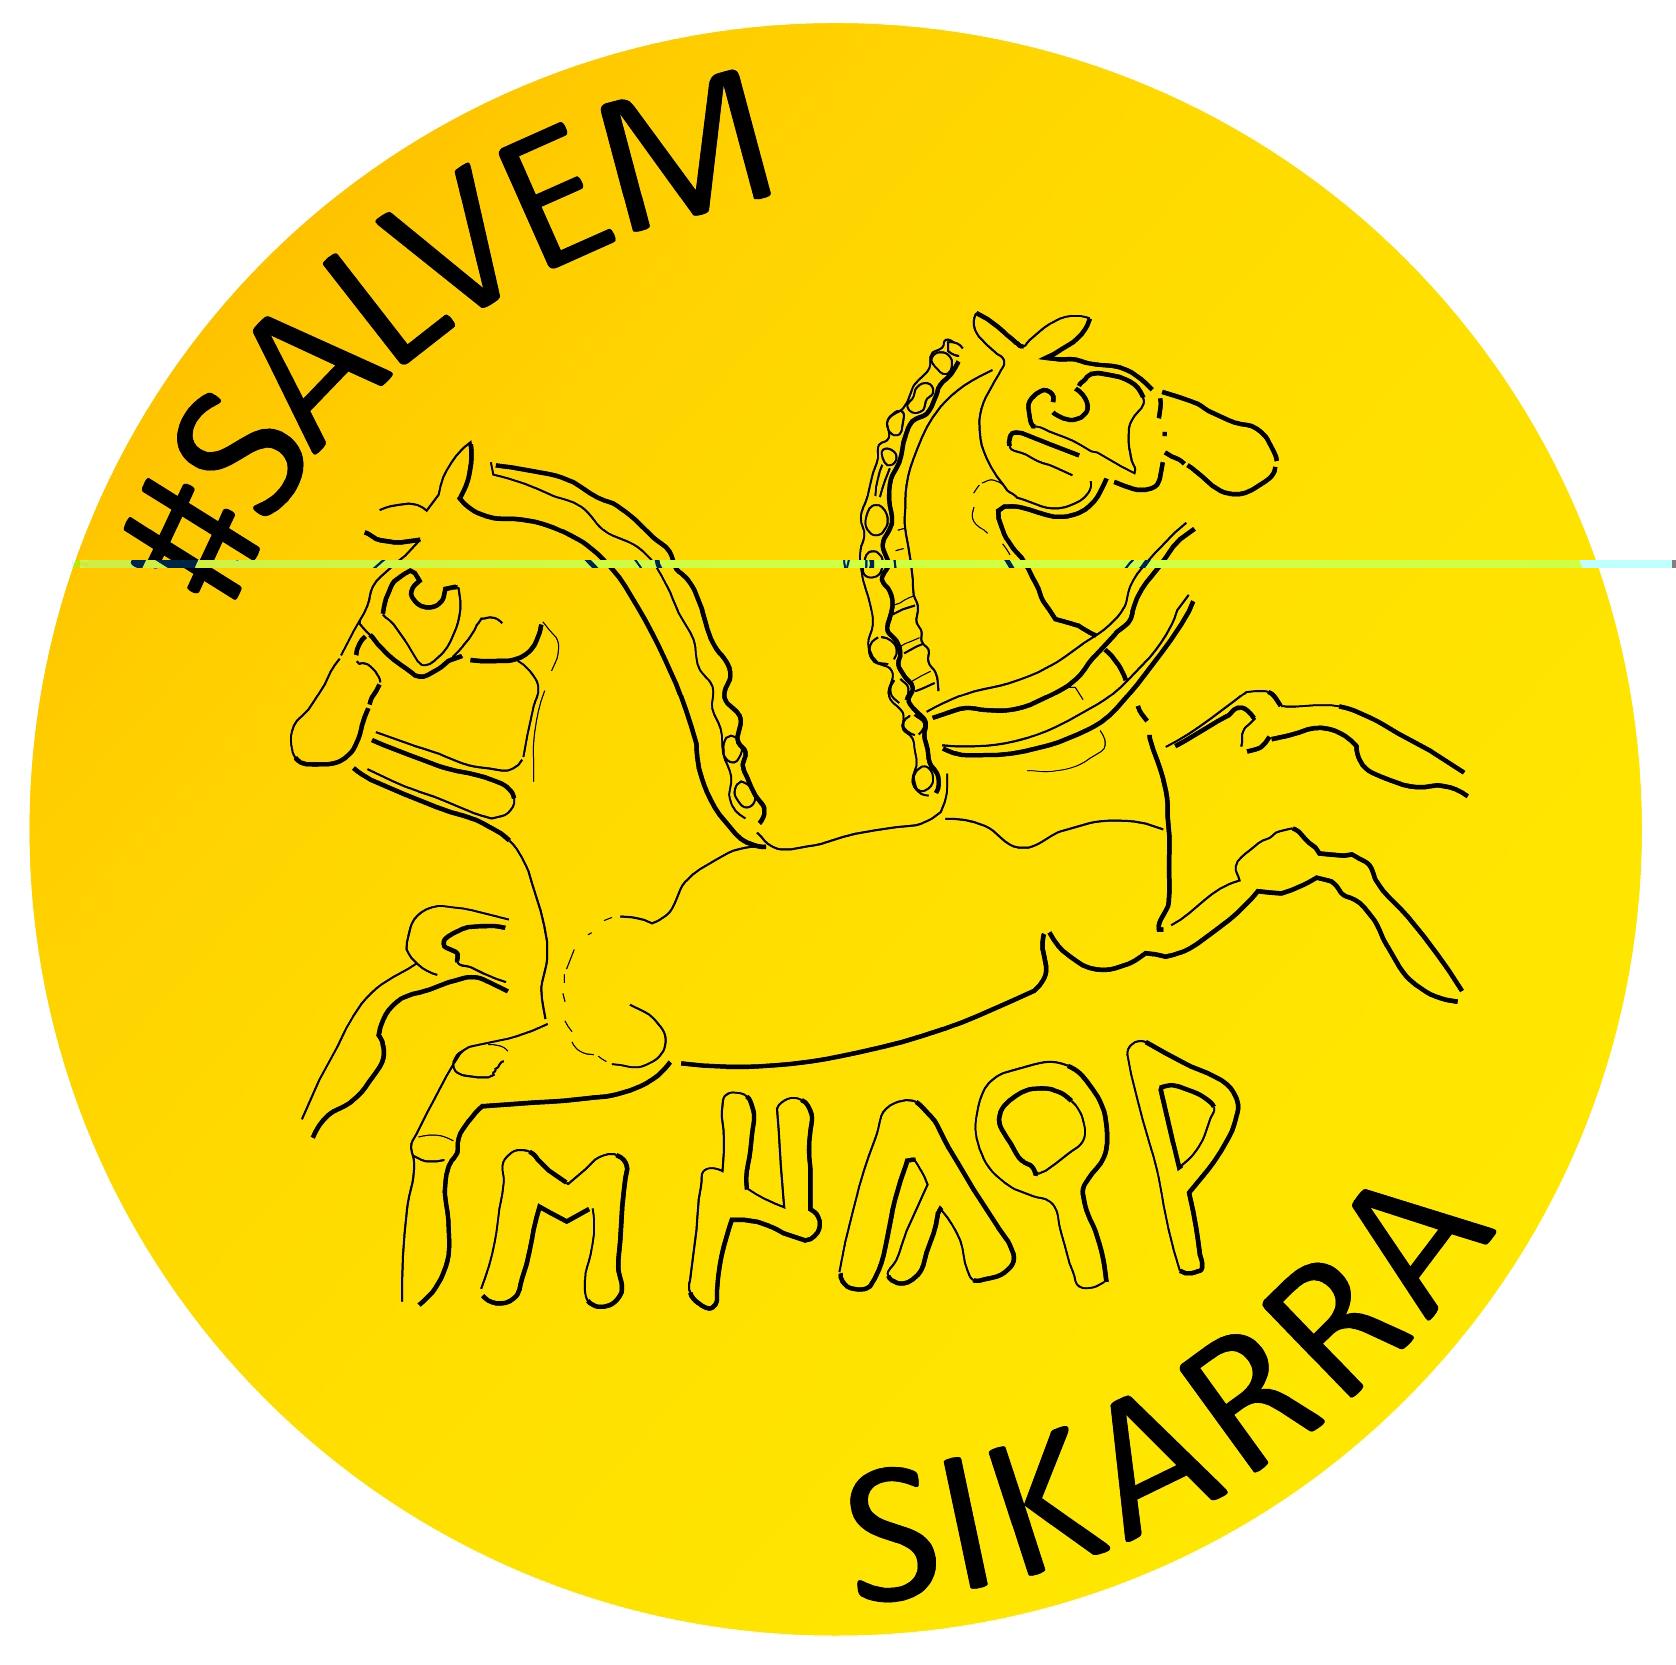 distintiu de la campanya #salvemSIKARRA -